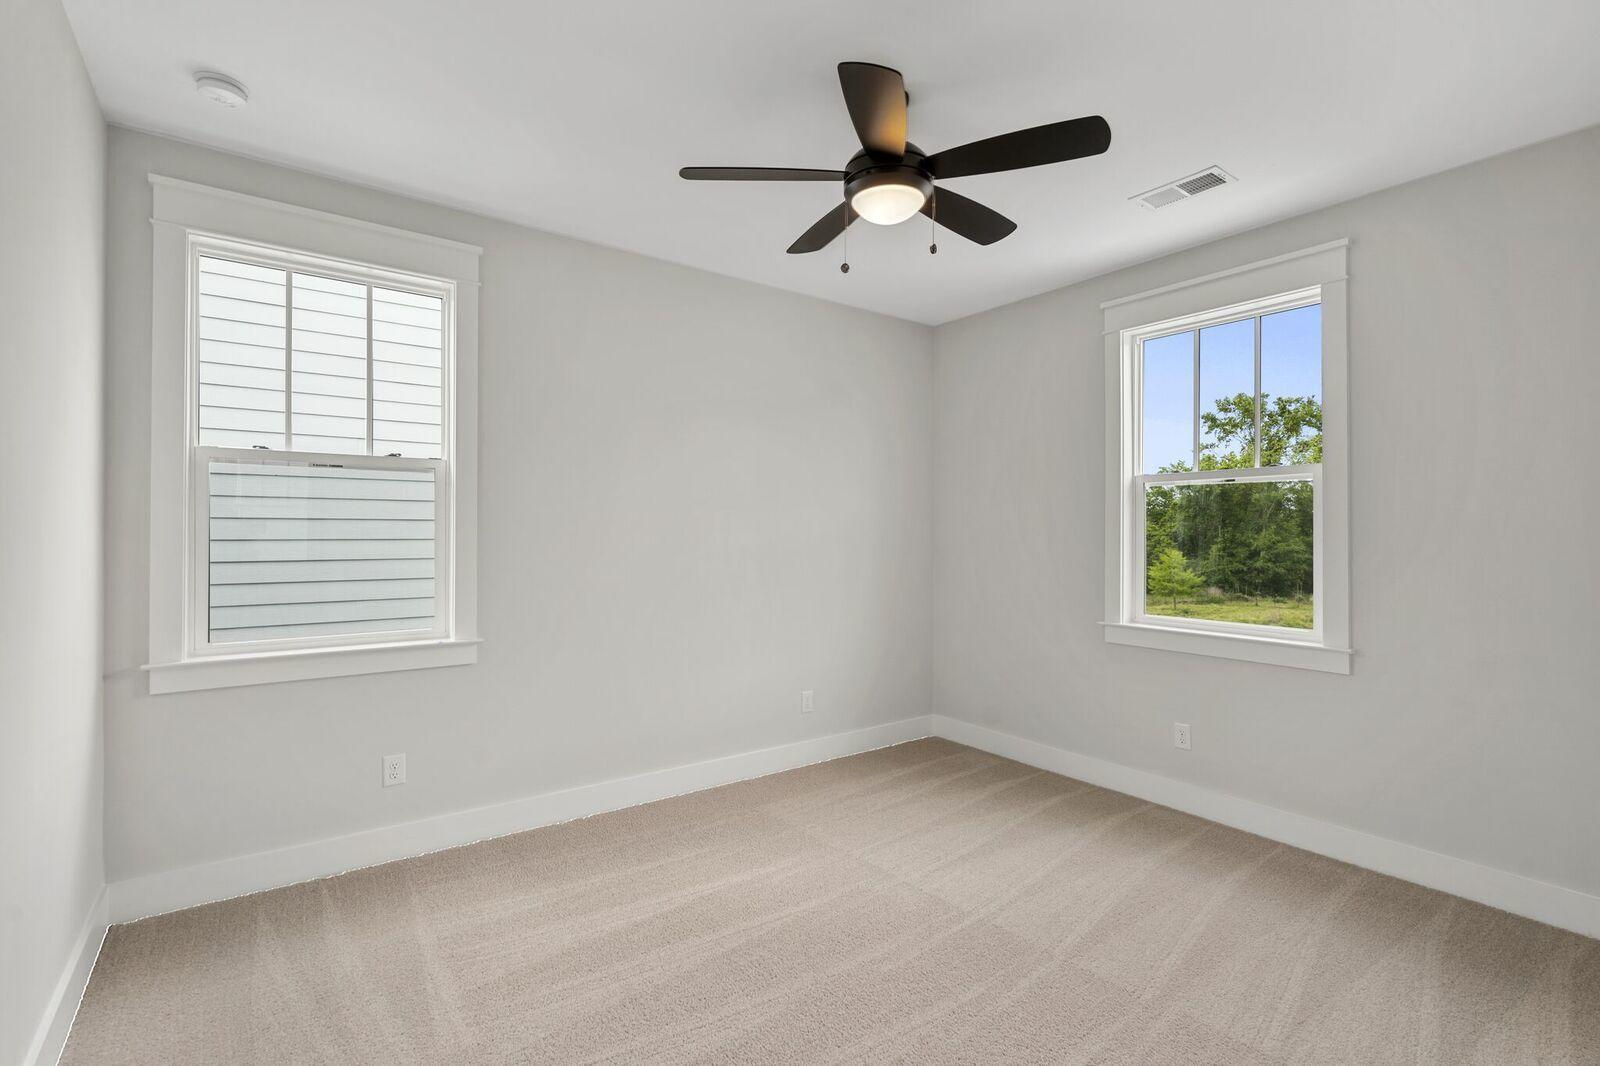 Midtown Homes For Sale - 1533 Kepley, Mount Pleasant, SC - 15